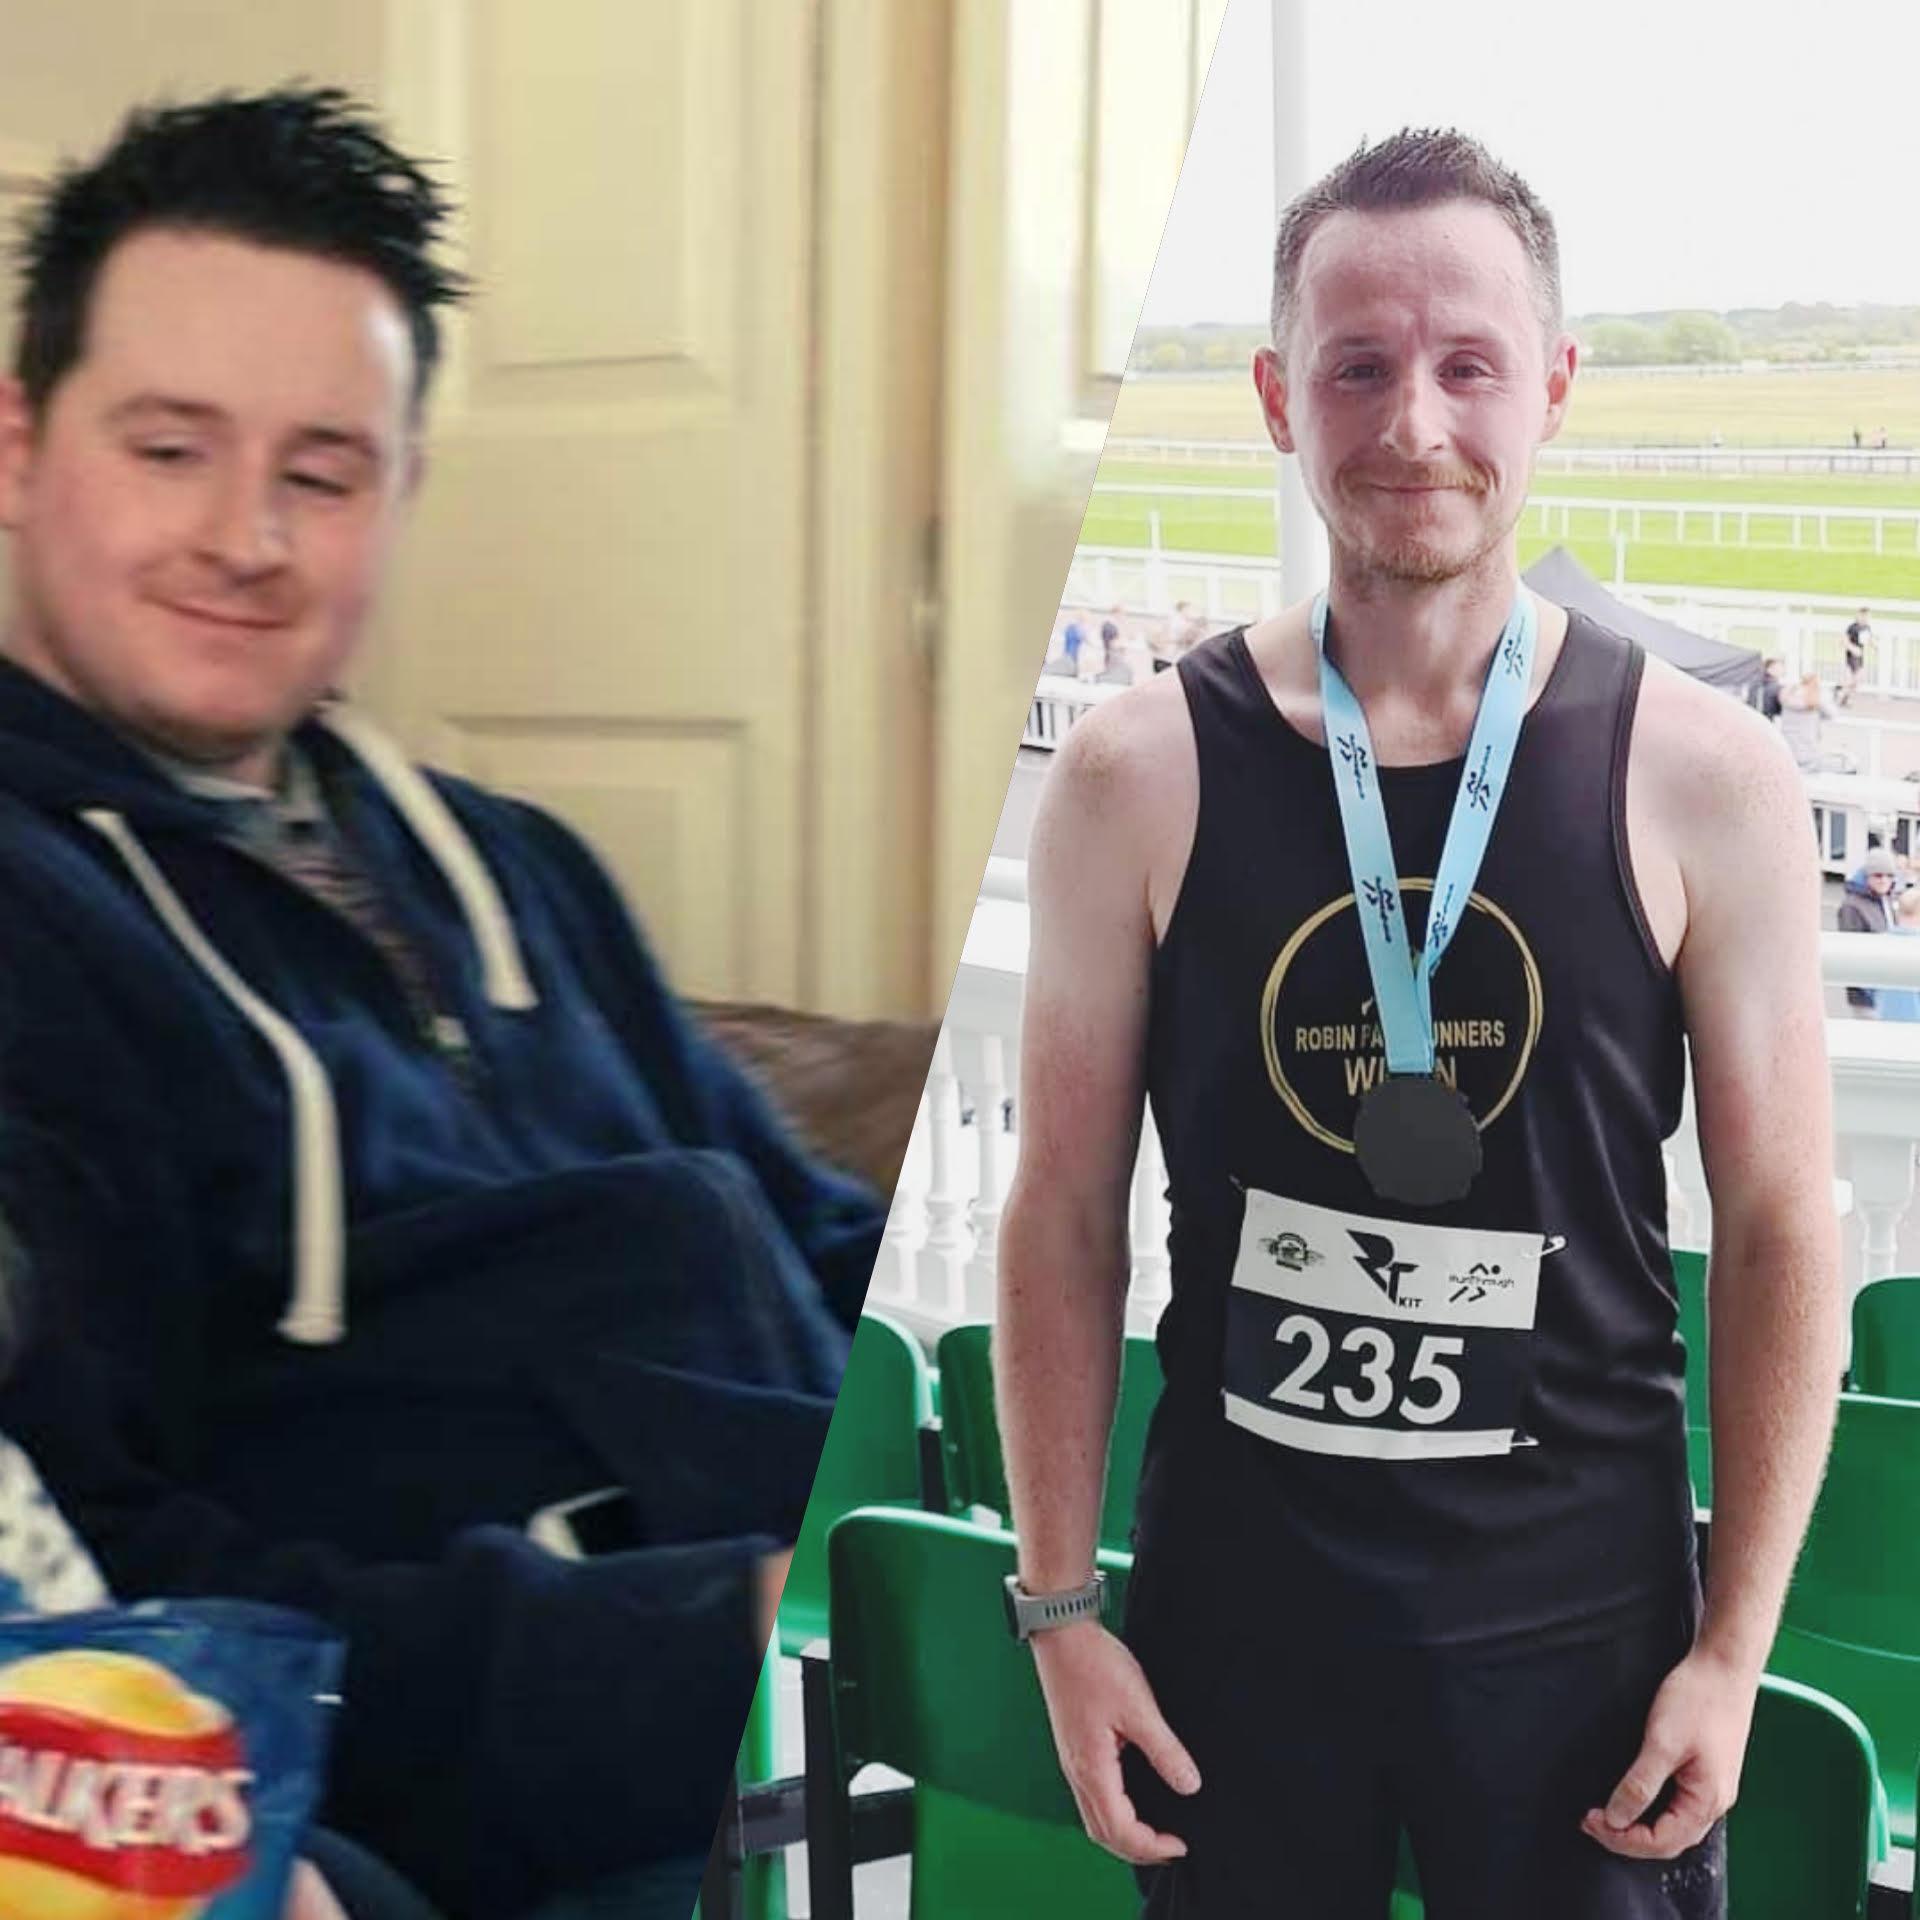 Runner Feature - David Lawless RunThrough Running Club London